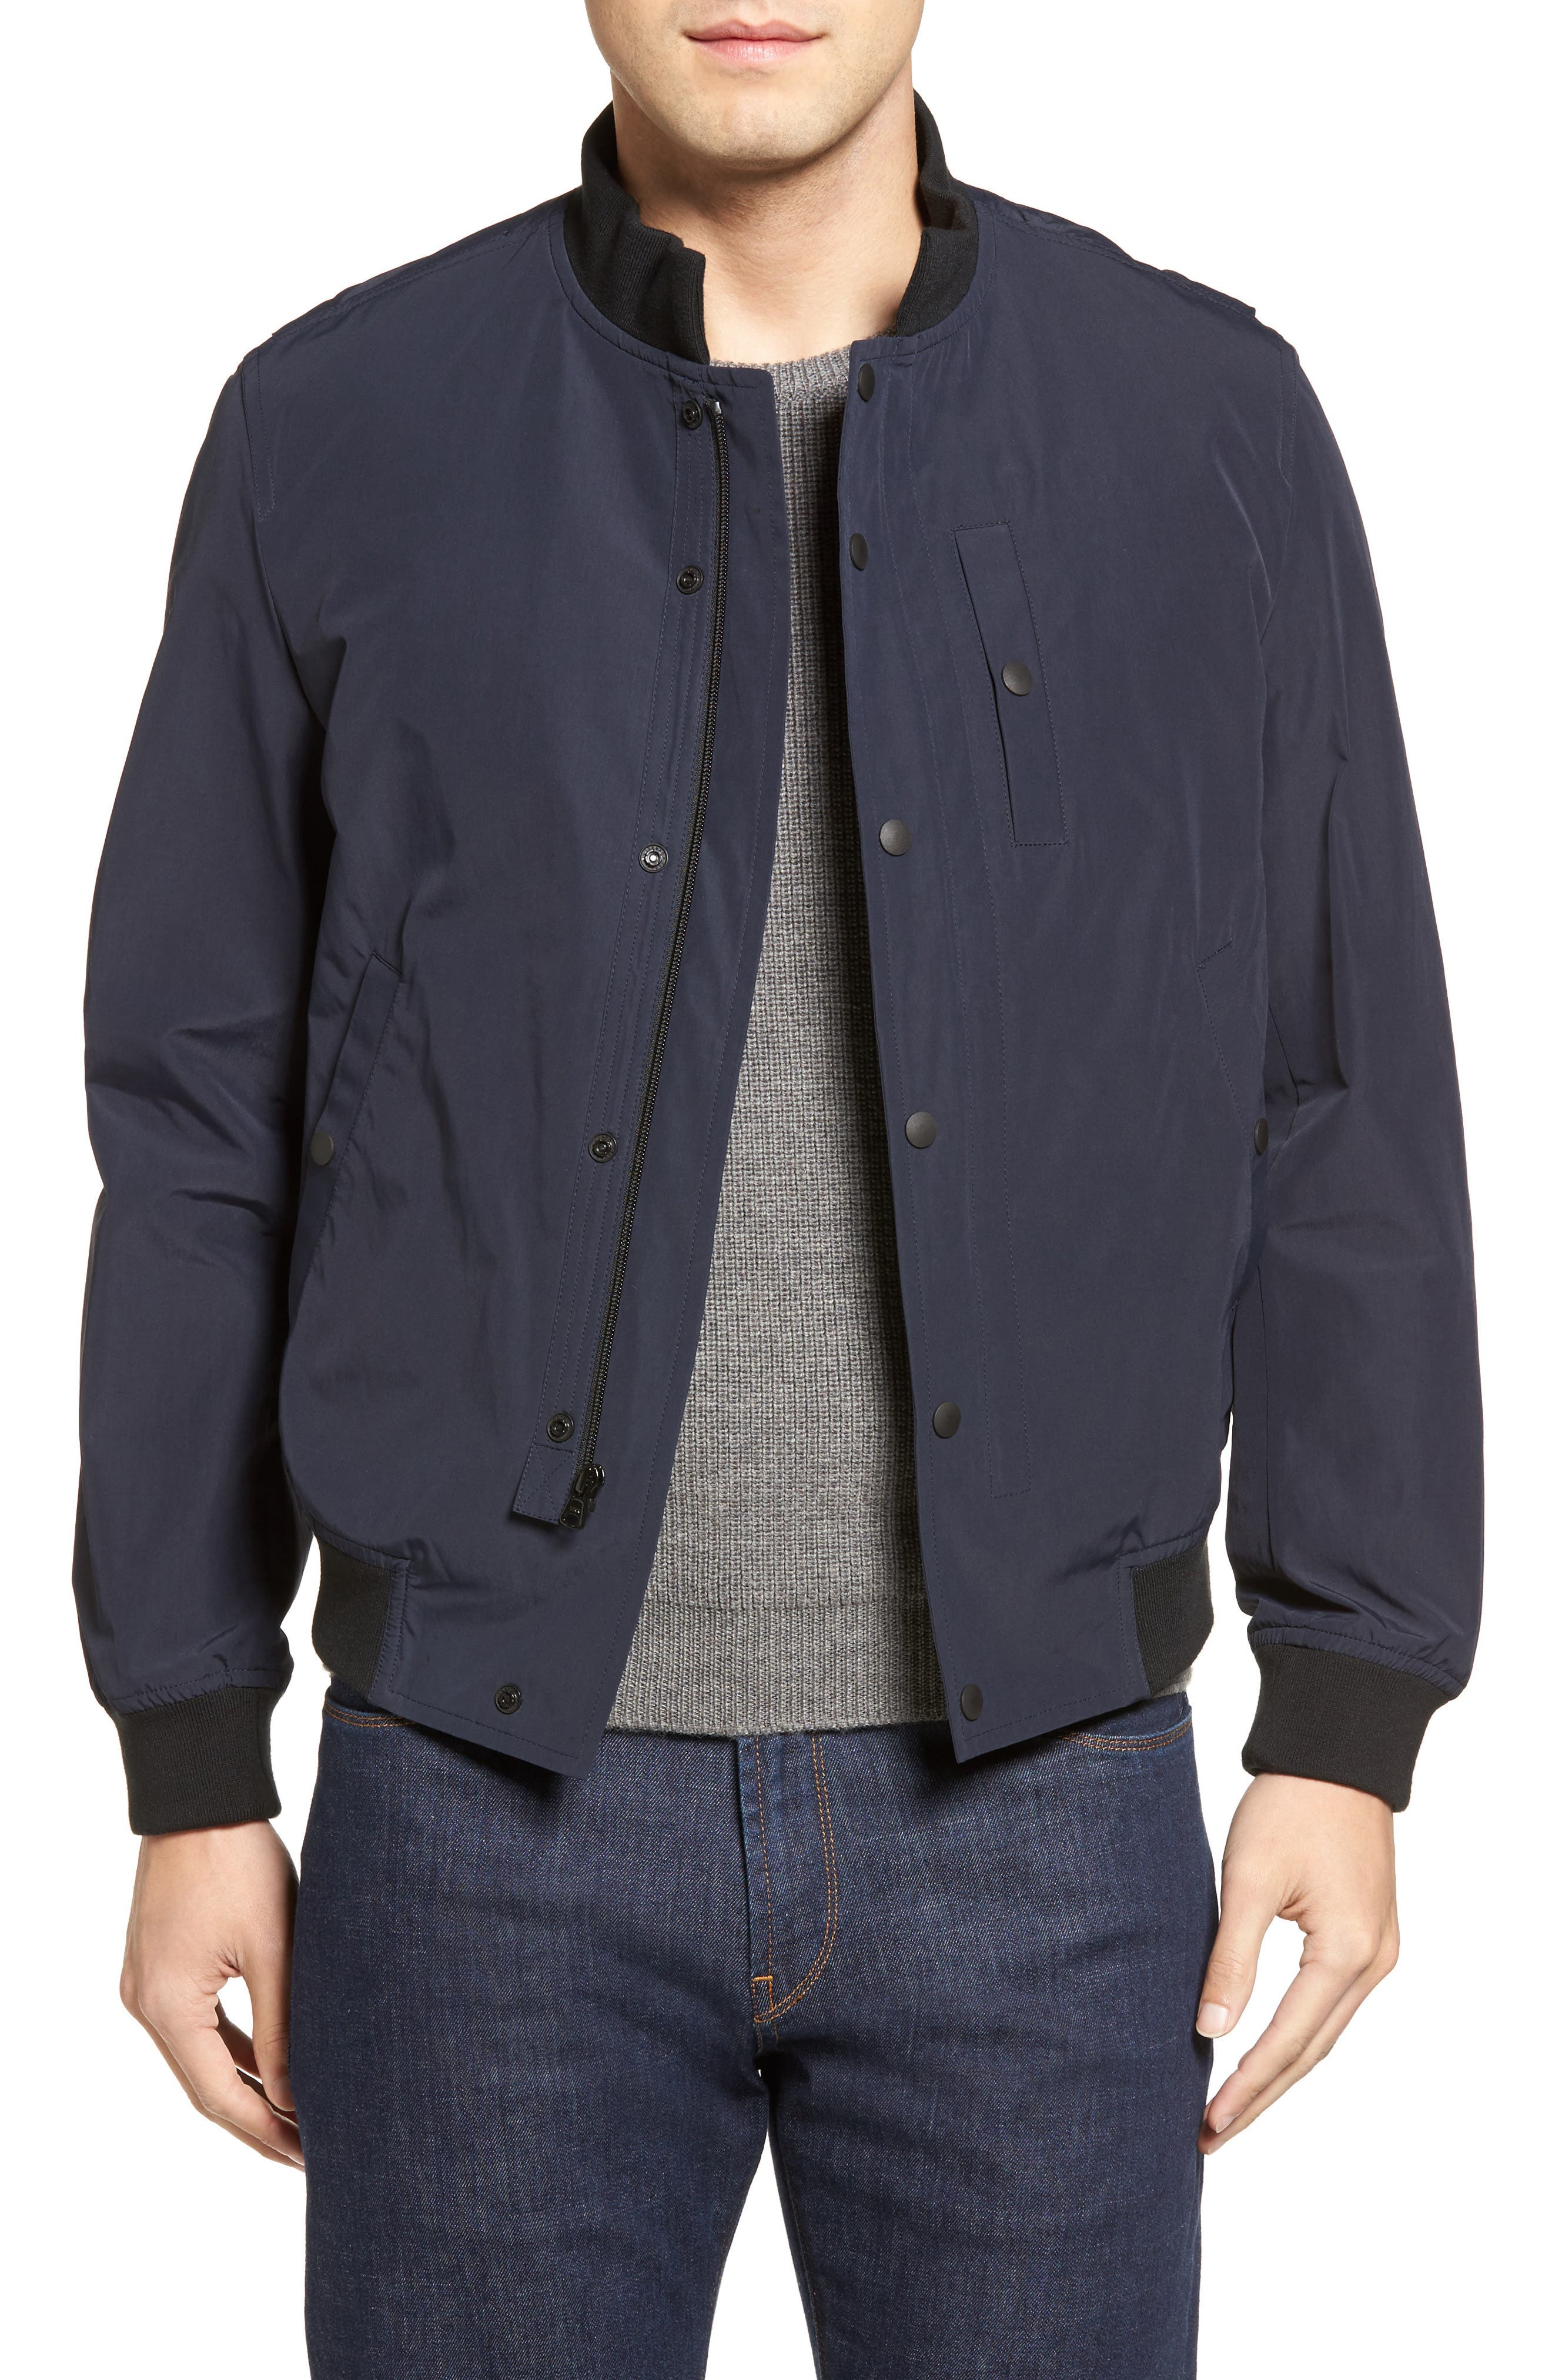 Water Repellent Jacket,                             Main thumbnail 1, color,                             429